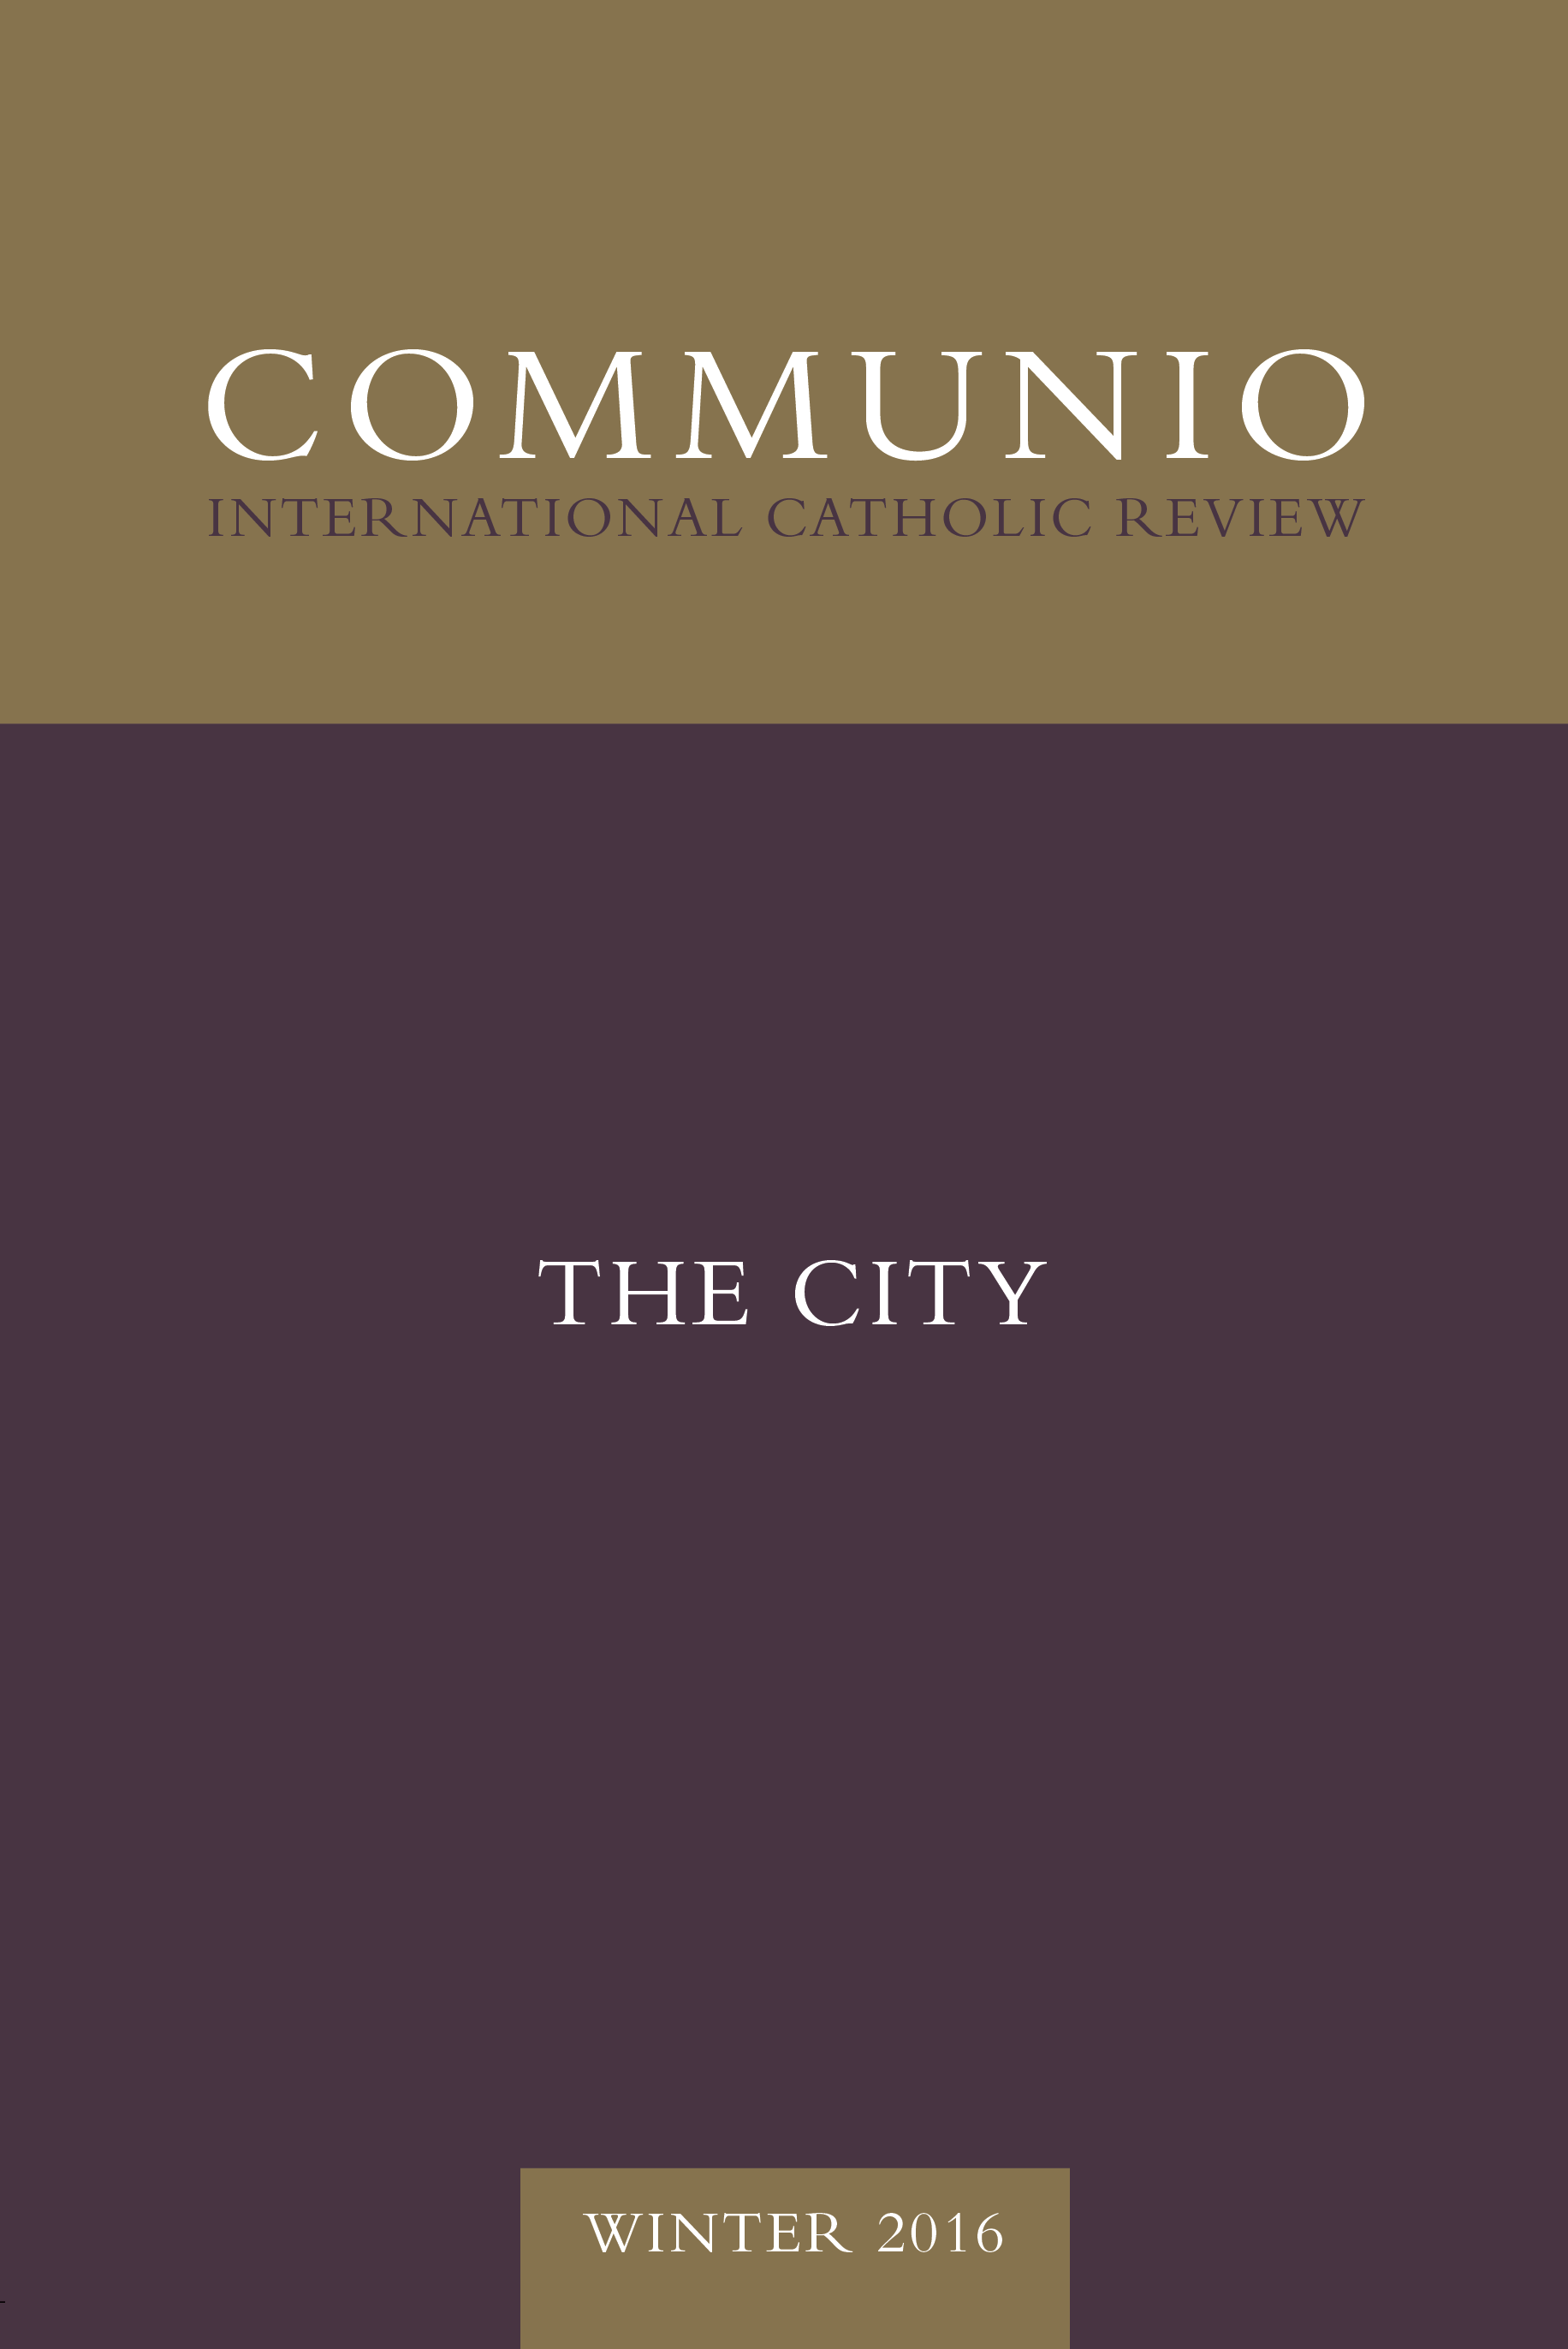 Communio - Winter 2016 - The City